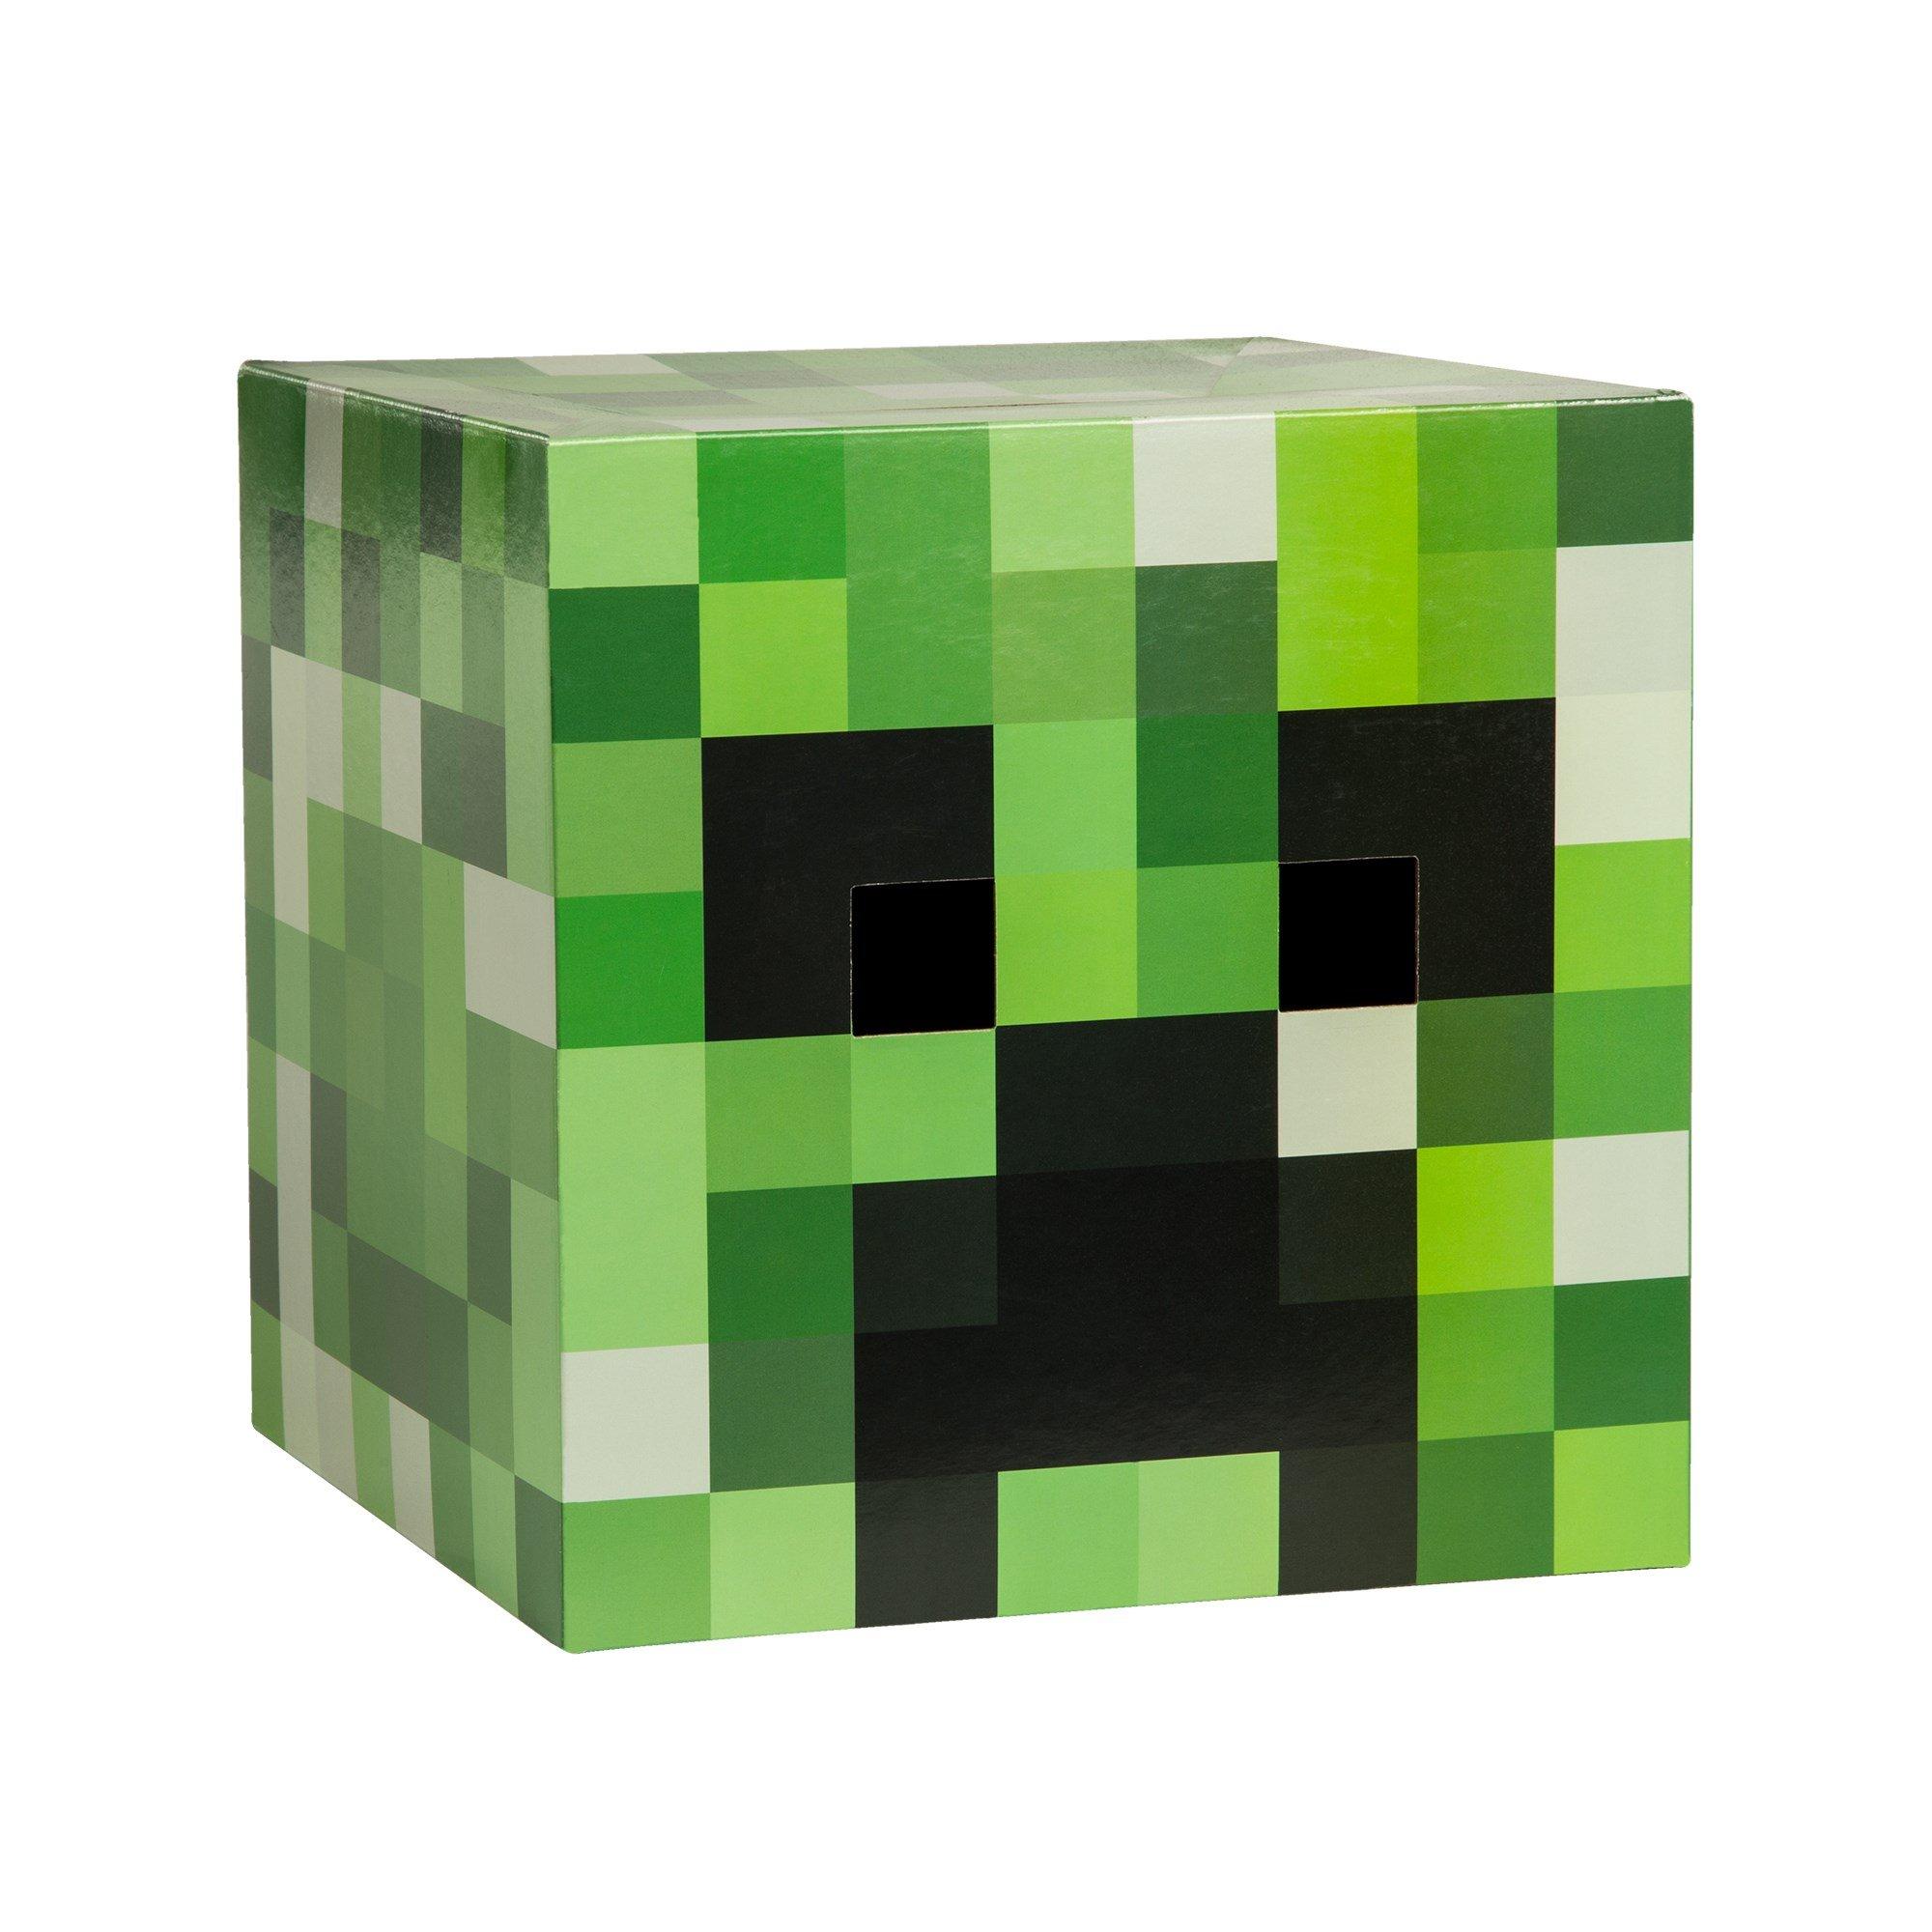 JINX Minecraft Creeper Head Costume Mask